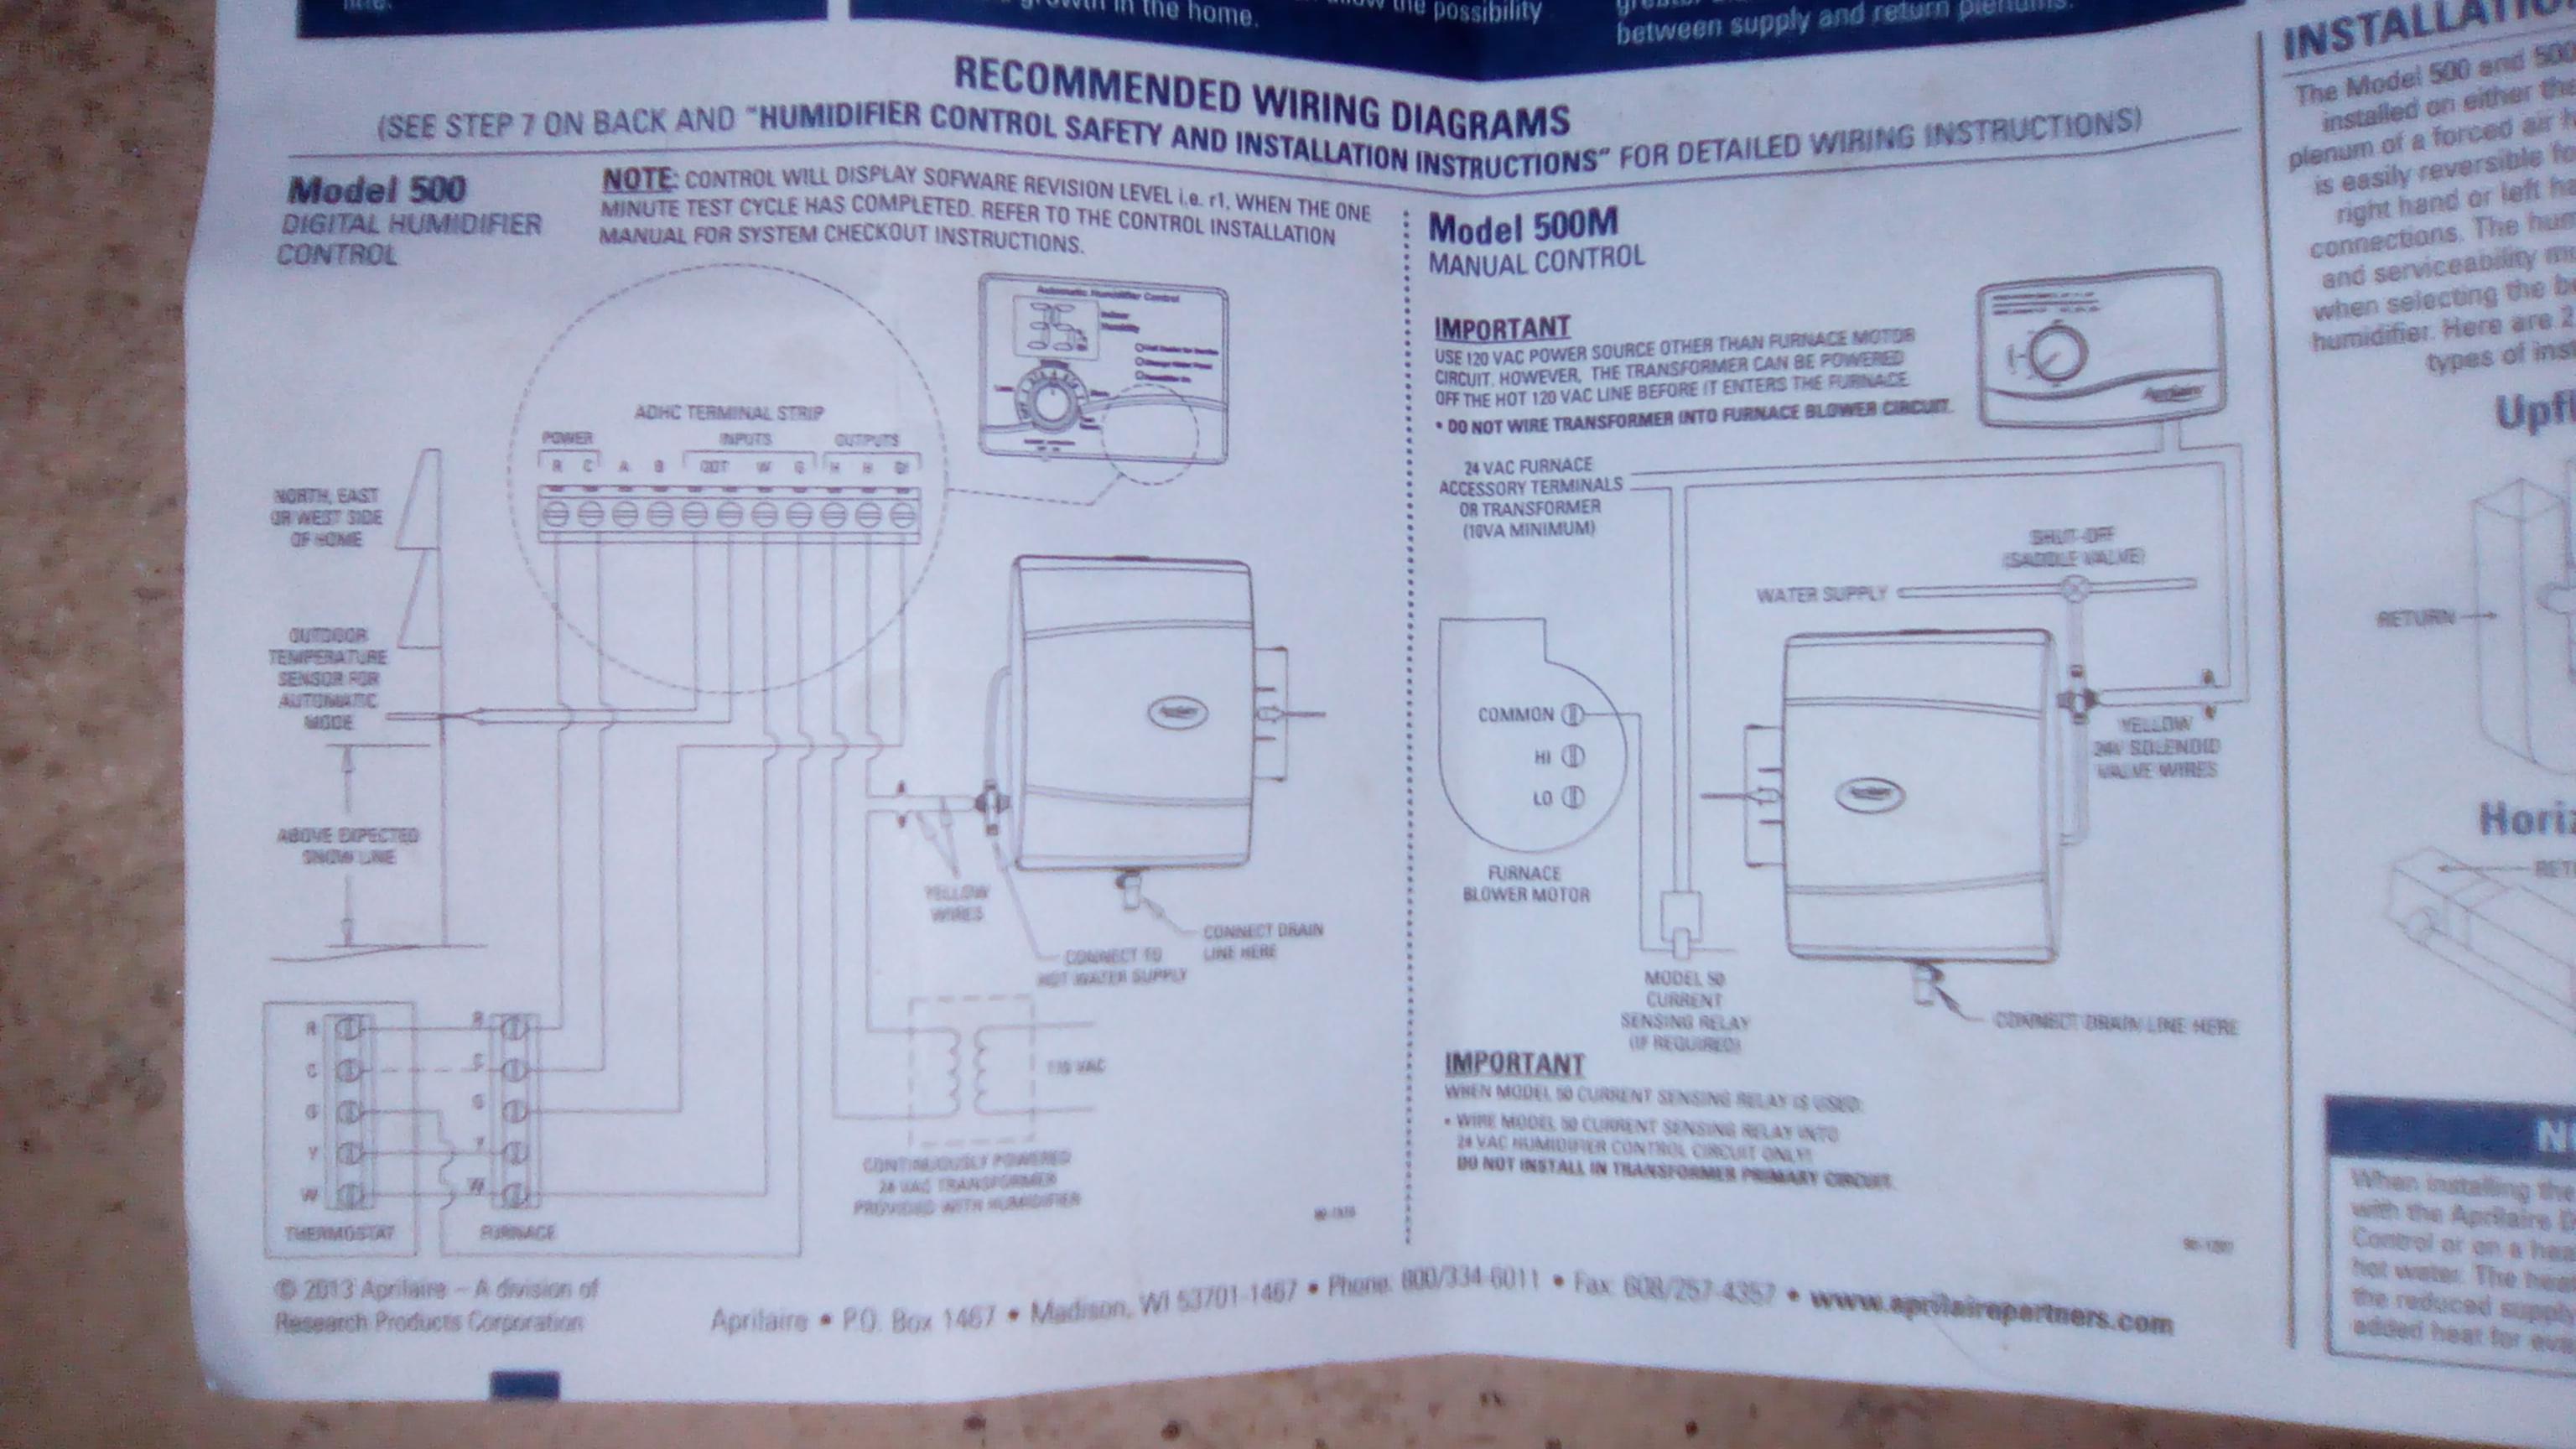 aprilaire 700m humidifier wiring diagram wiring diagramsAudi 500 Wiring Diagram #7